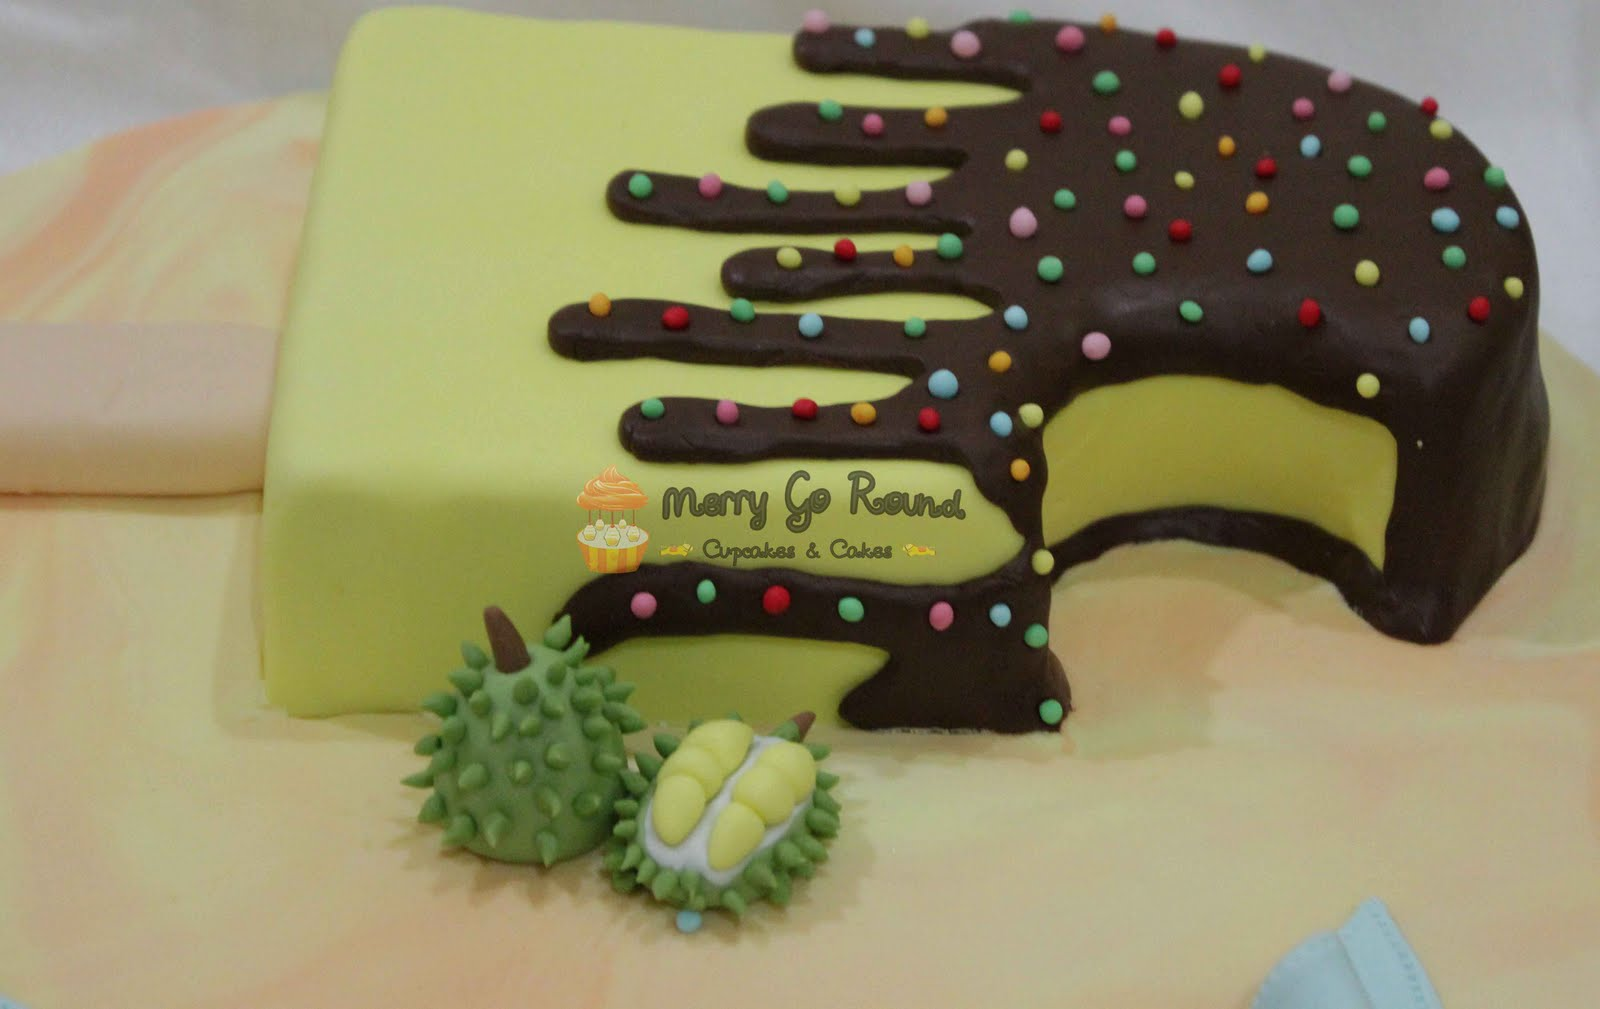 Ice Cream Shaped Cake : Merry Go Round - Cupcakes & Cakes: Durian Ice Cream Shaped ...